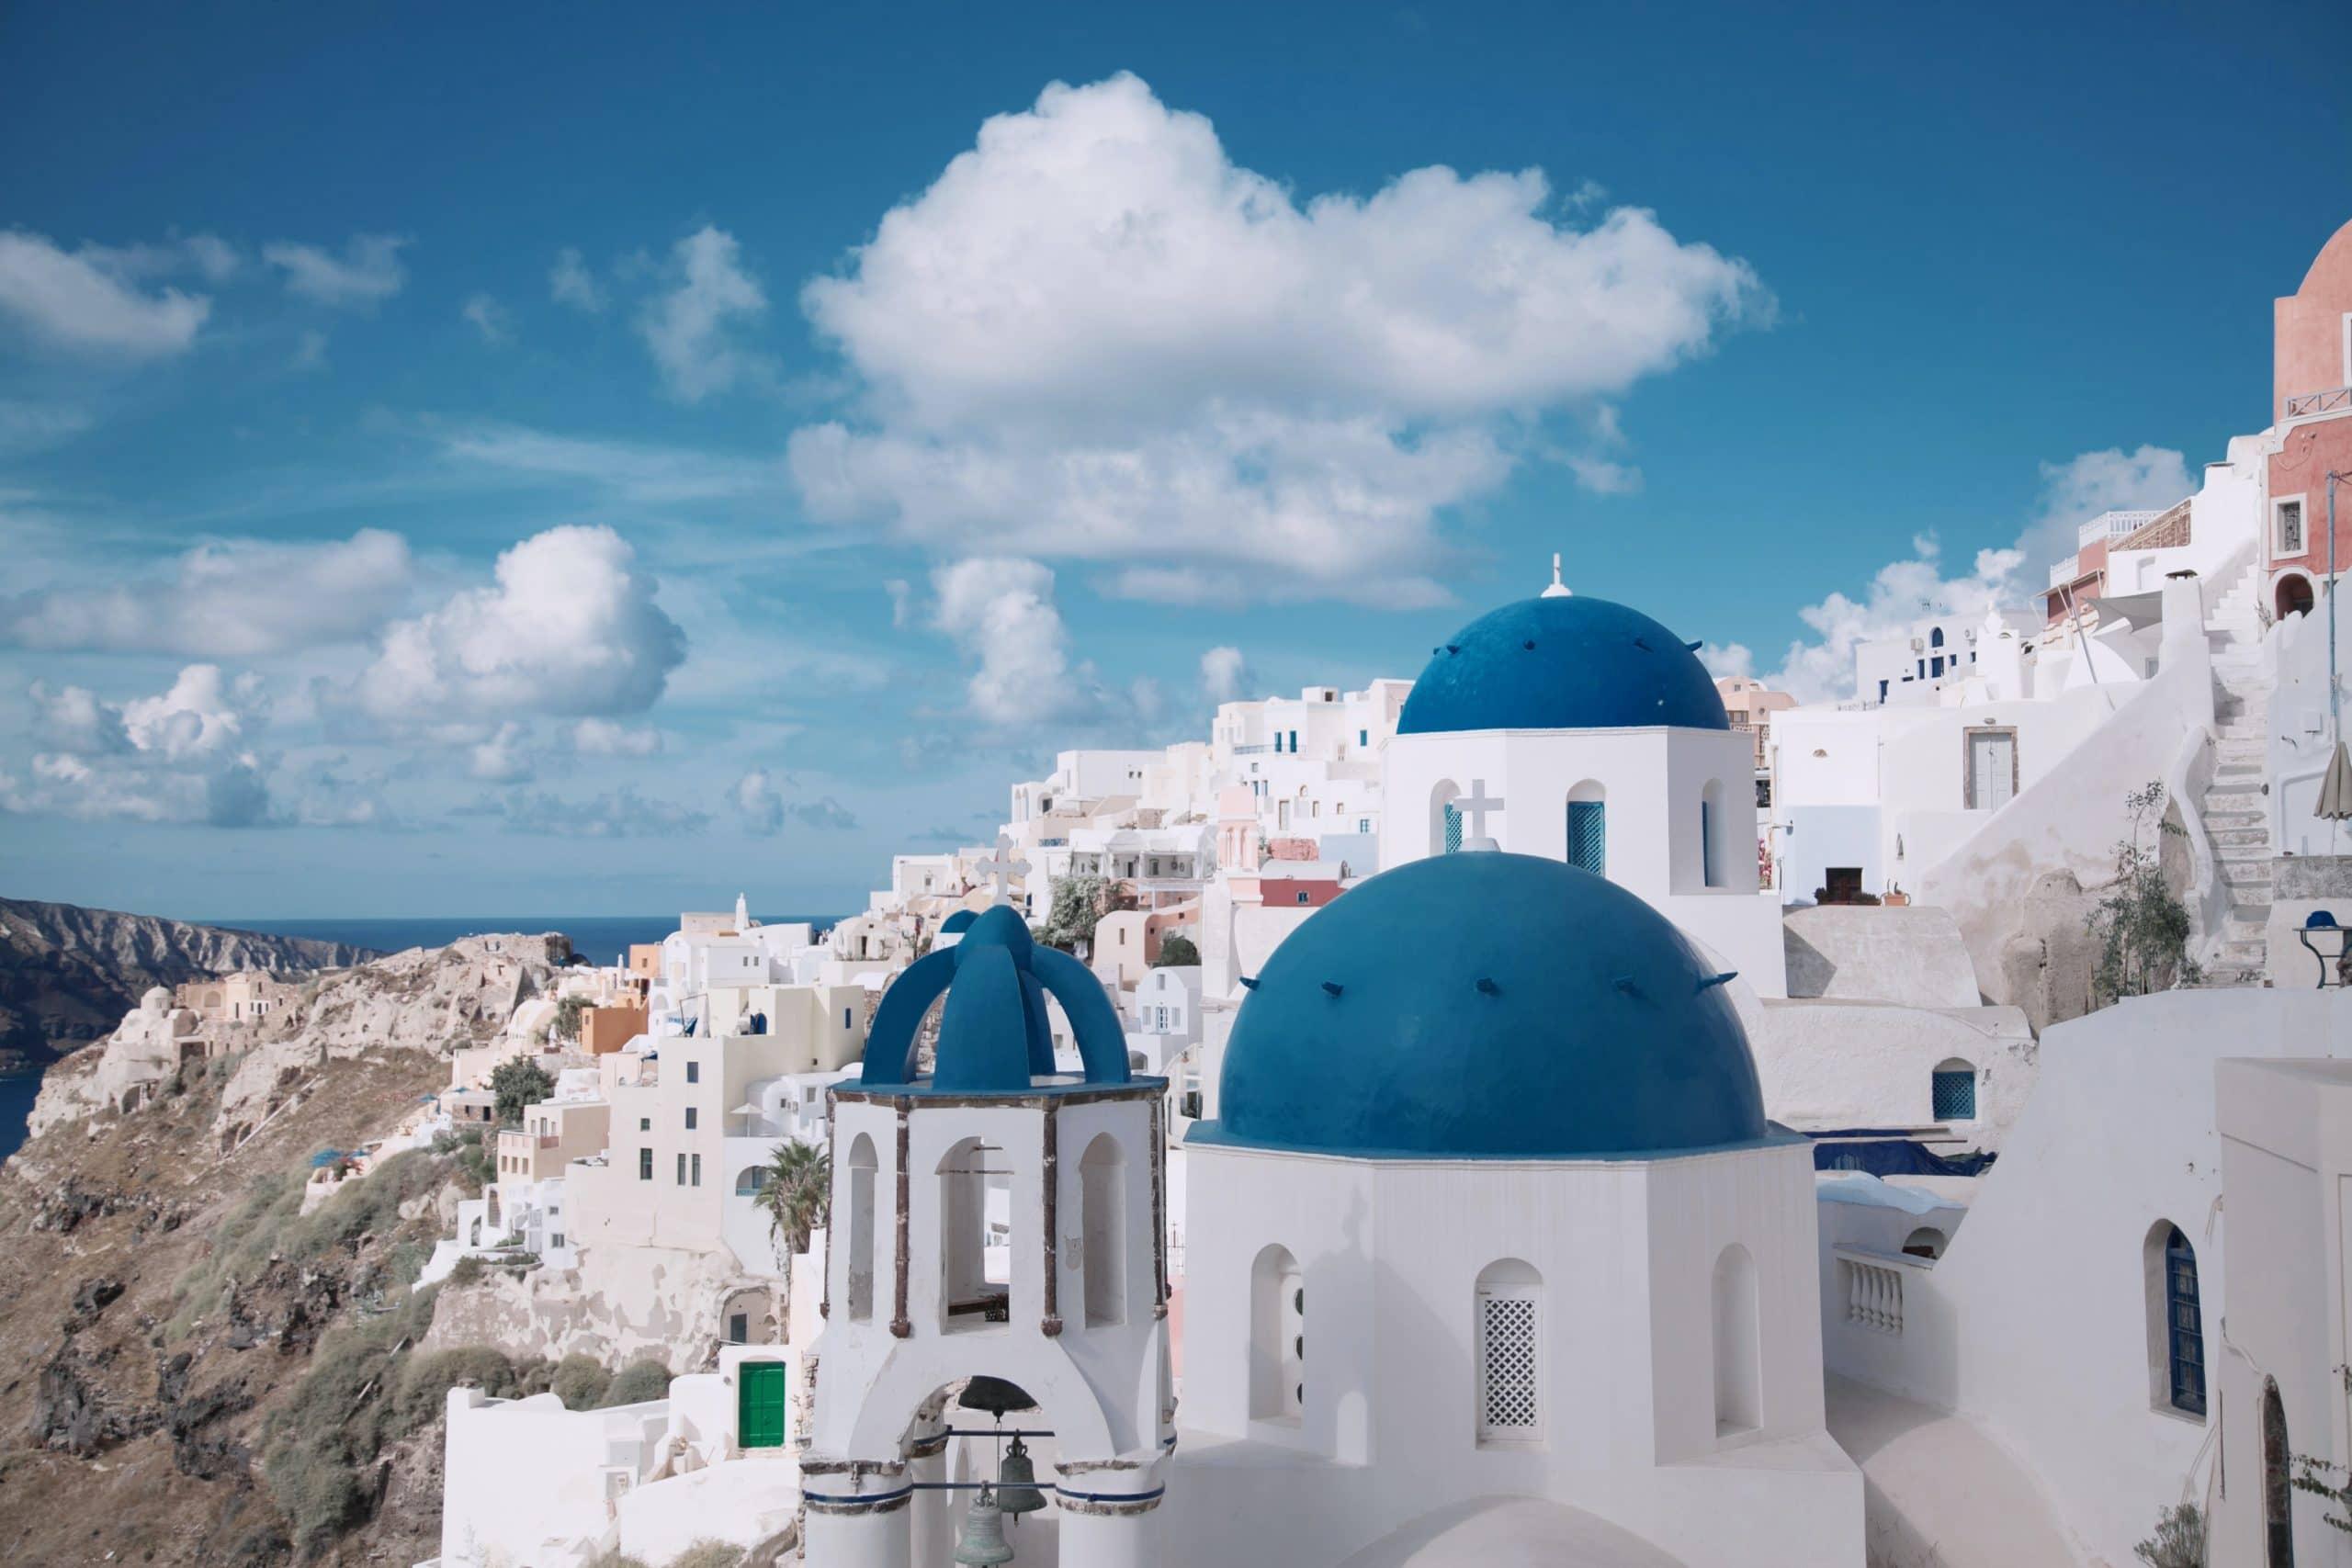 costumbres extrañas de Grecia